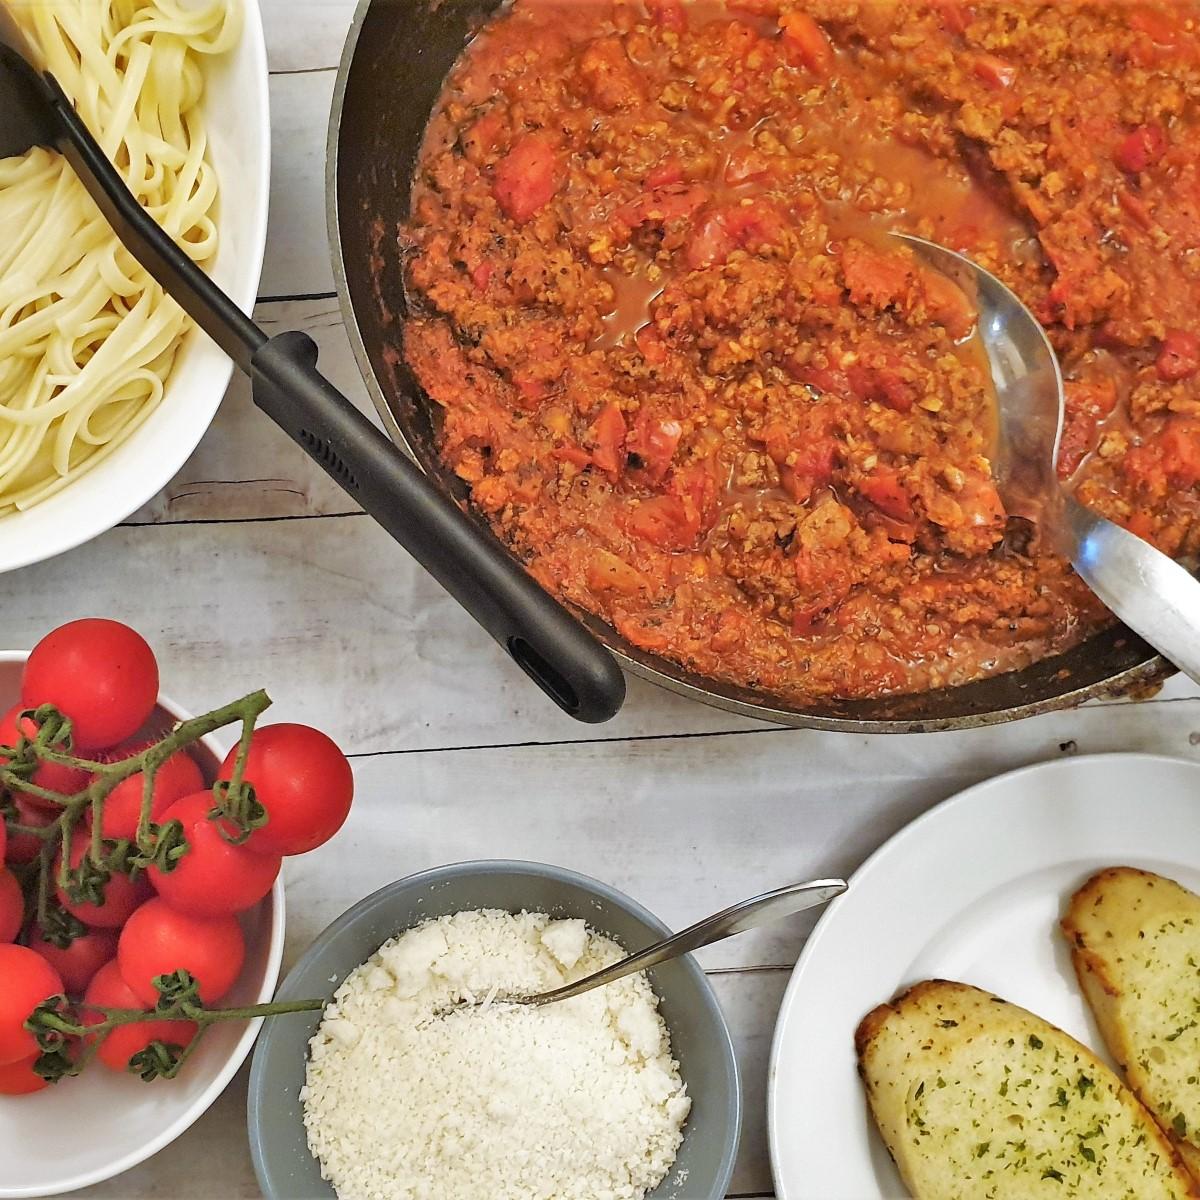 A pan of spaghetti bolognese sauce.